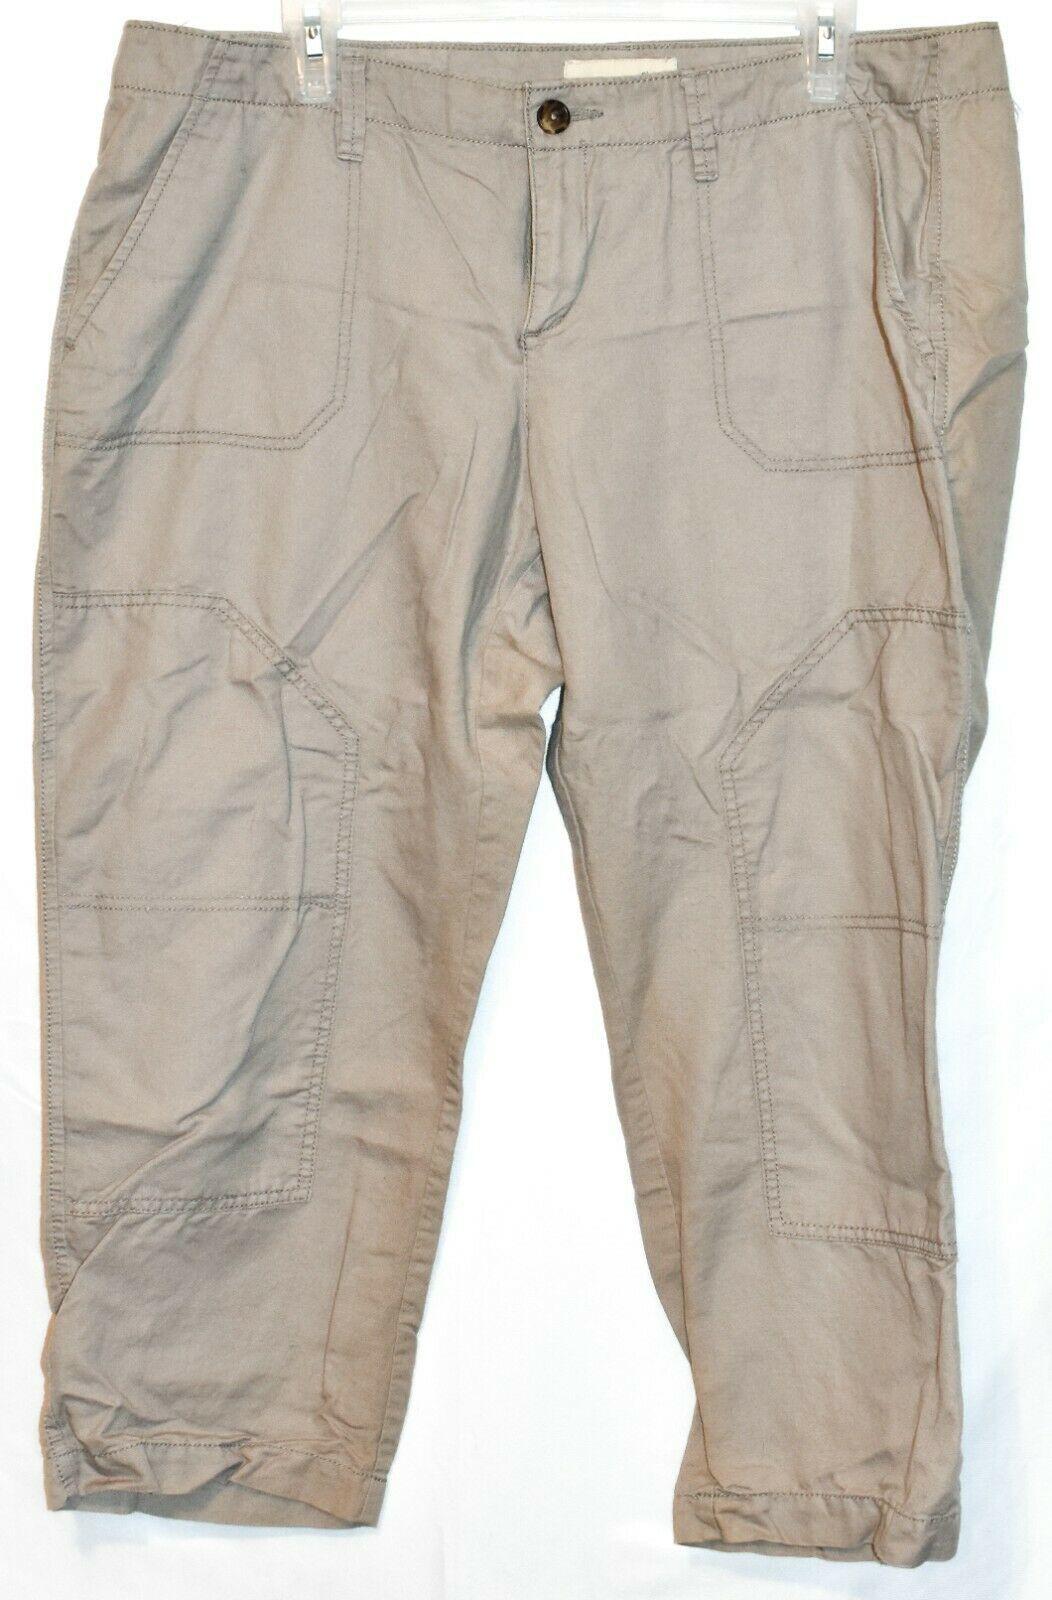 Old Navy Women's Tan Brown Linen Cotton Faux Cargo Carpi Cropped Pants Size 14